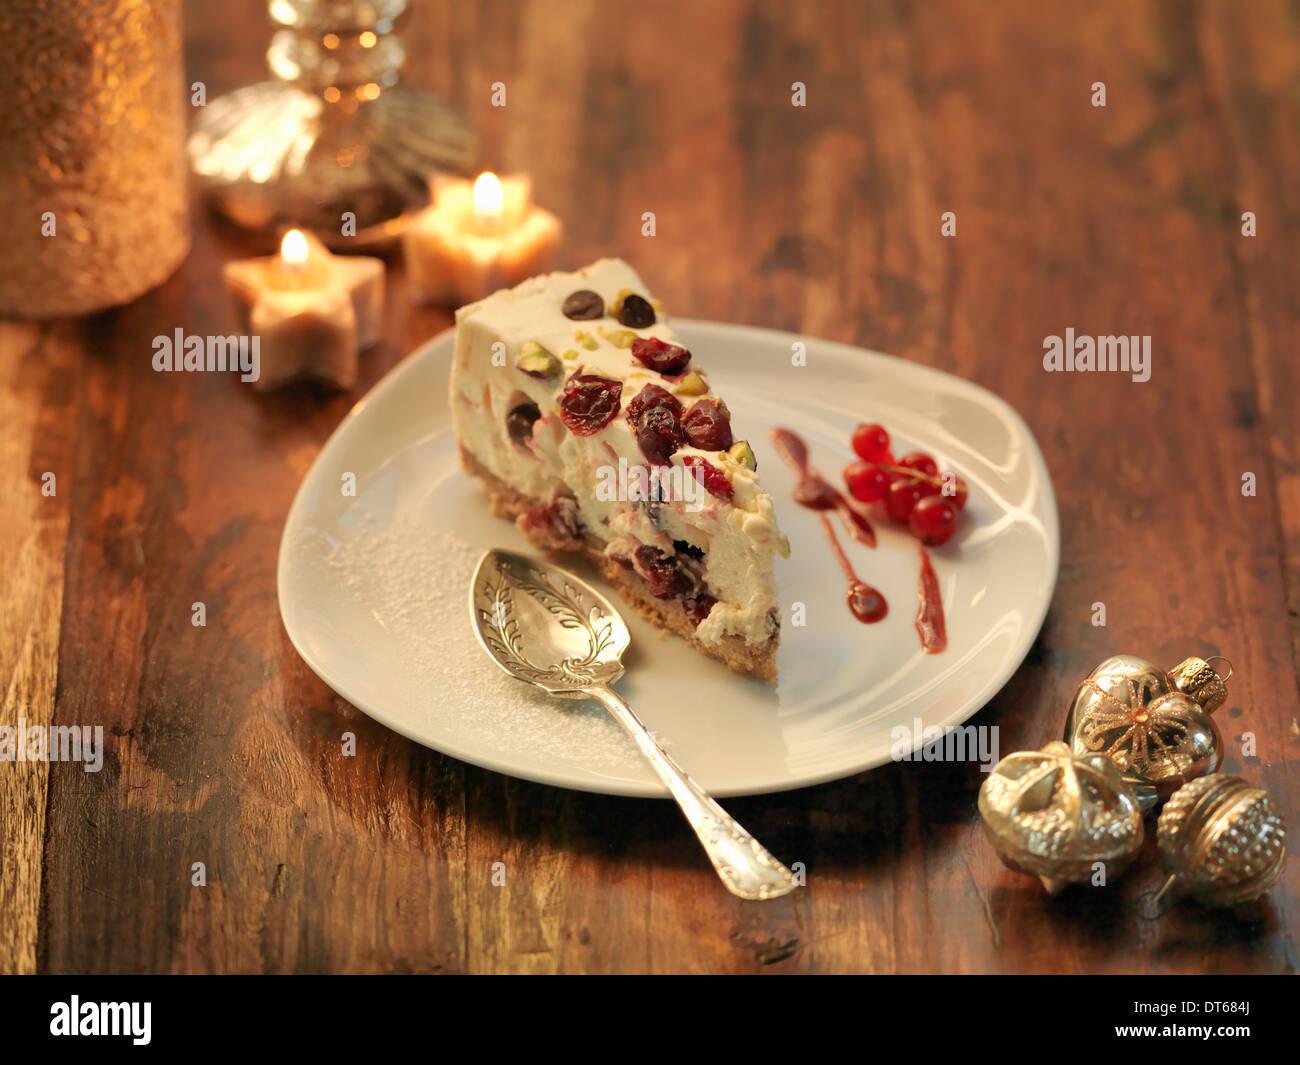 Mascarpone cheesecake with cranberry, pistachio, orange zest and chocolate chip amongst festive decorations - Stock Image